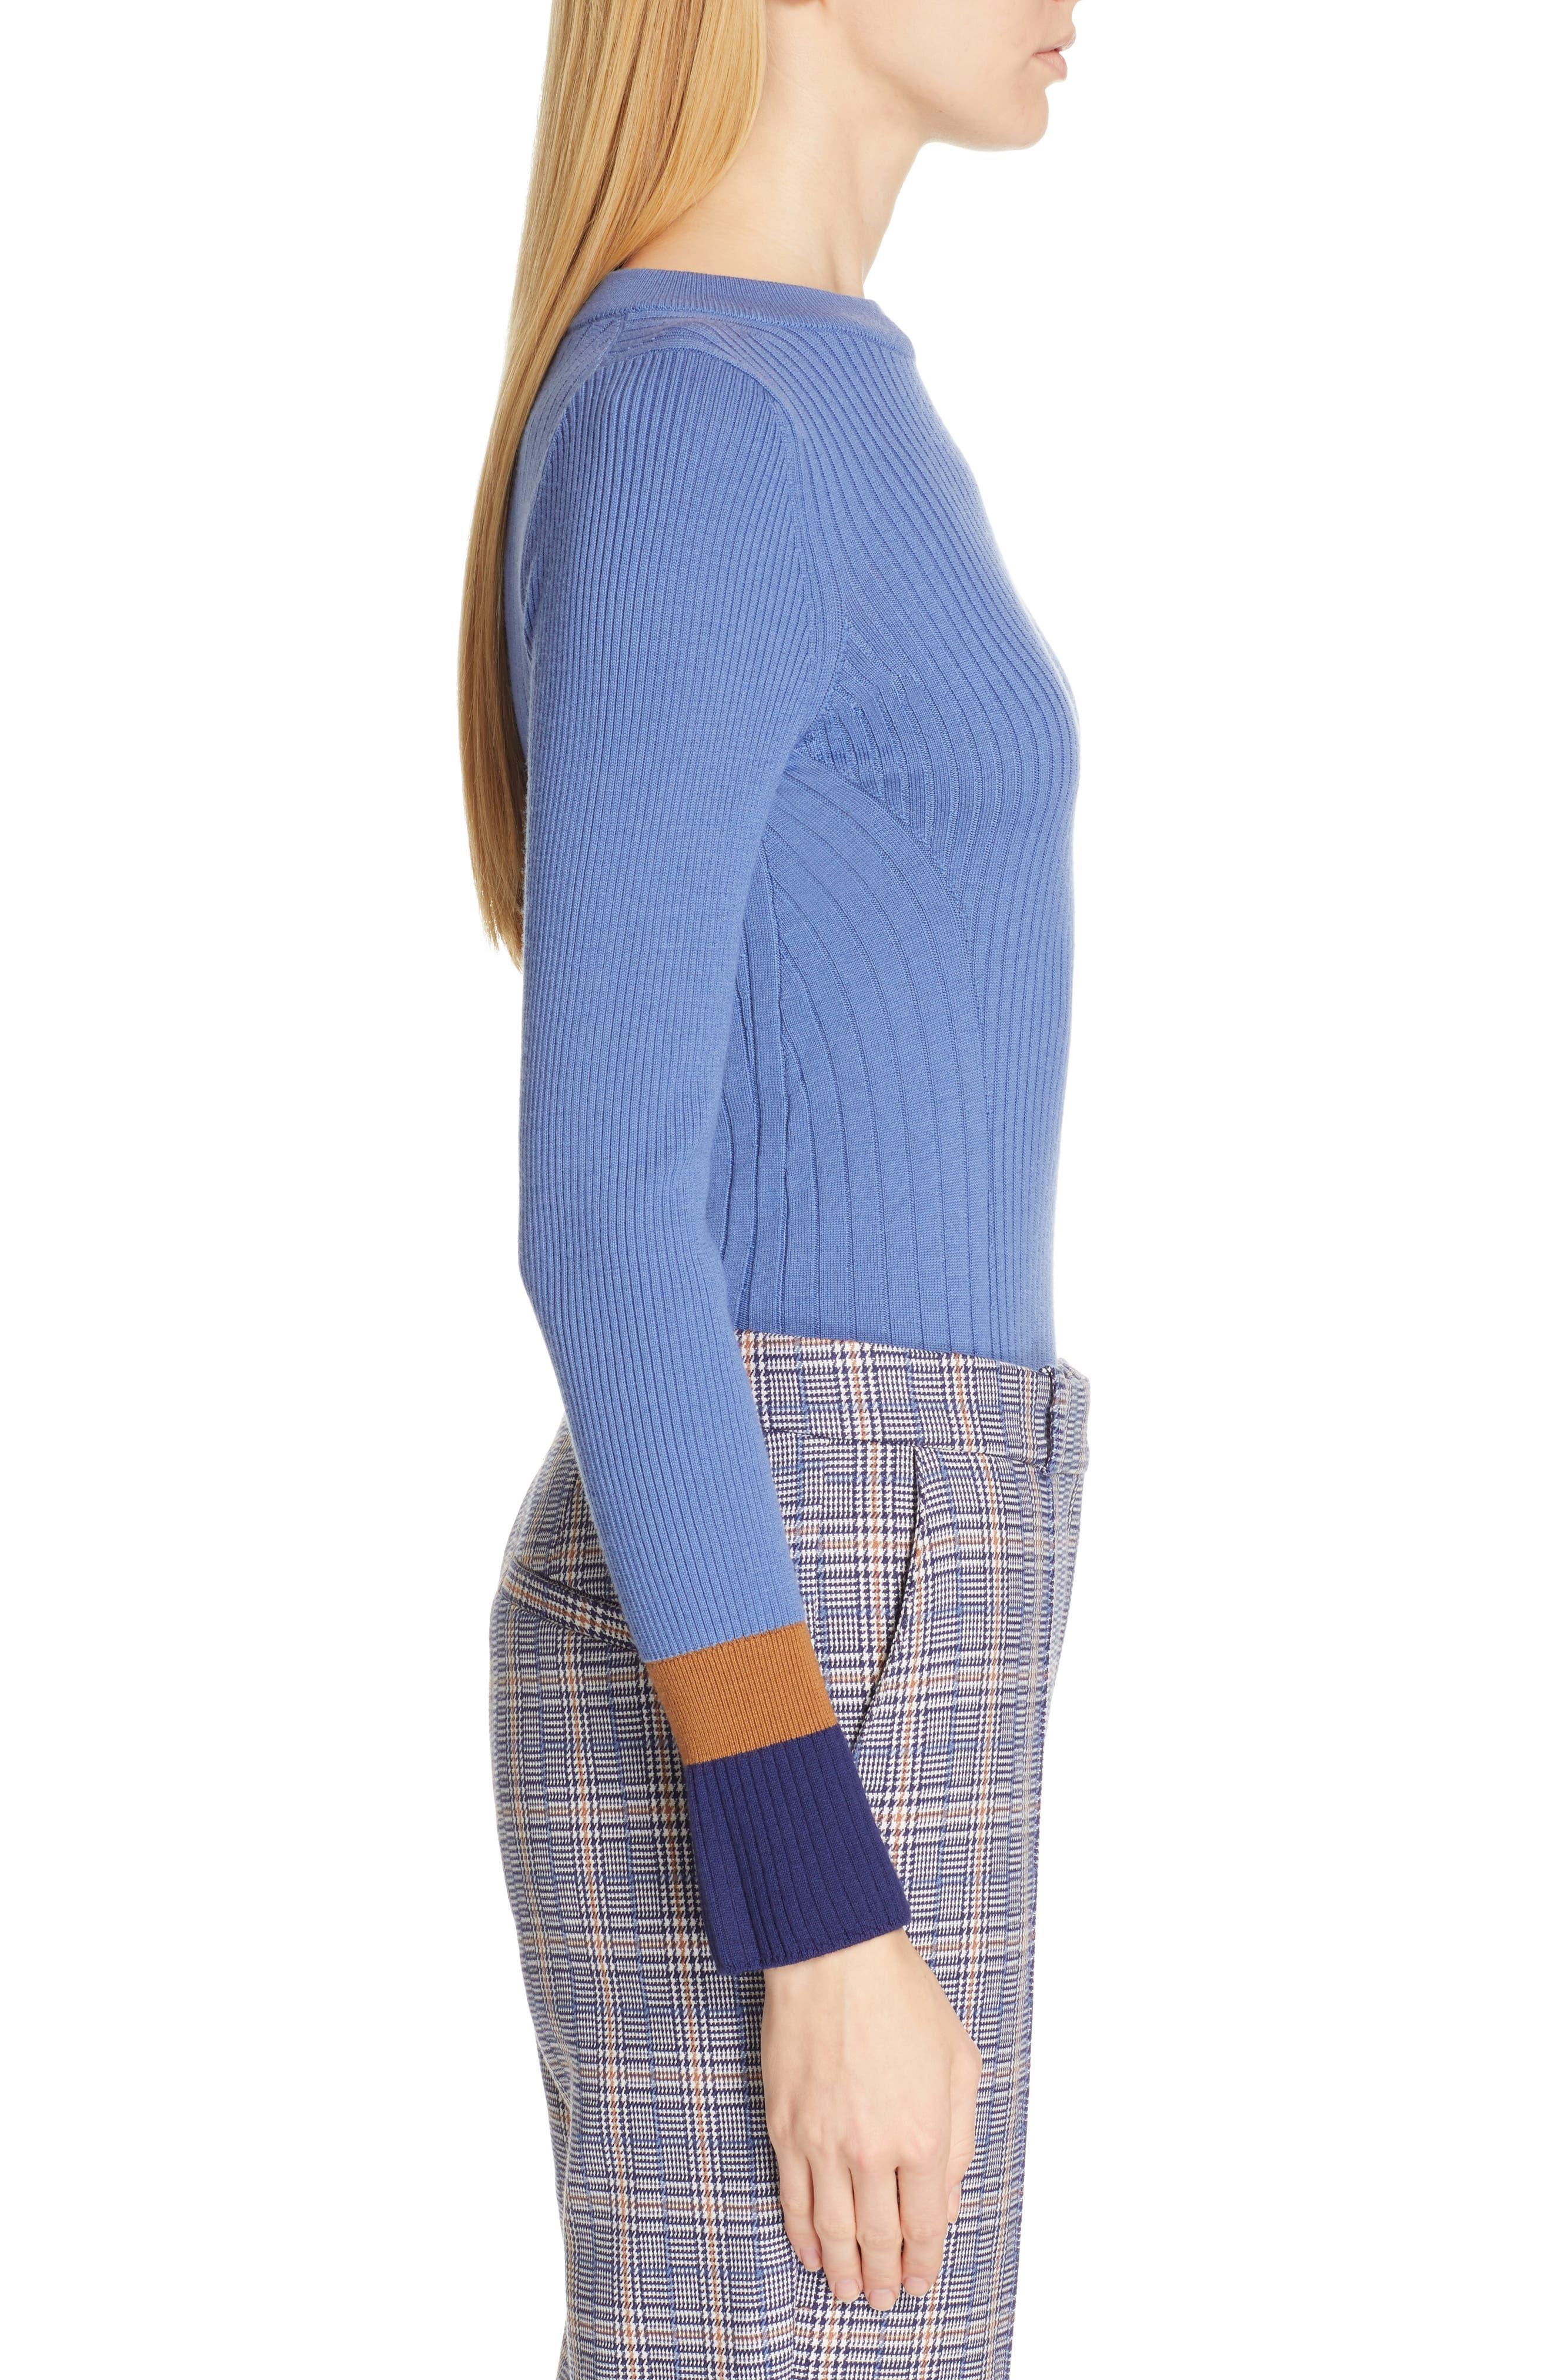 Fadeline Blue Fantasy Ribbed Wool Sweater,                             Alternate thumbnail 3, color,                             SOFT BLUE FANTASY